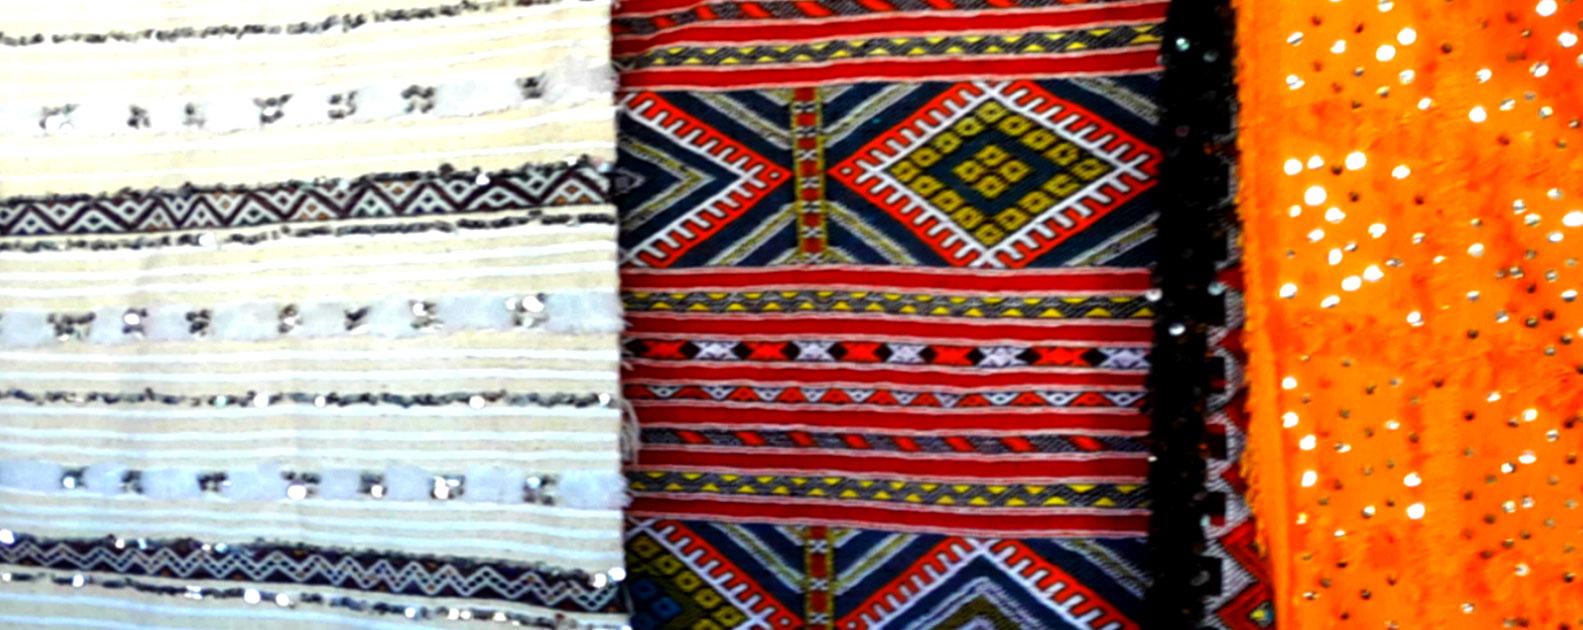 Shopping artigianale berbero a Taroudant